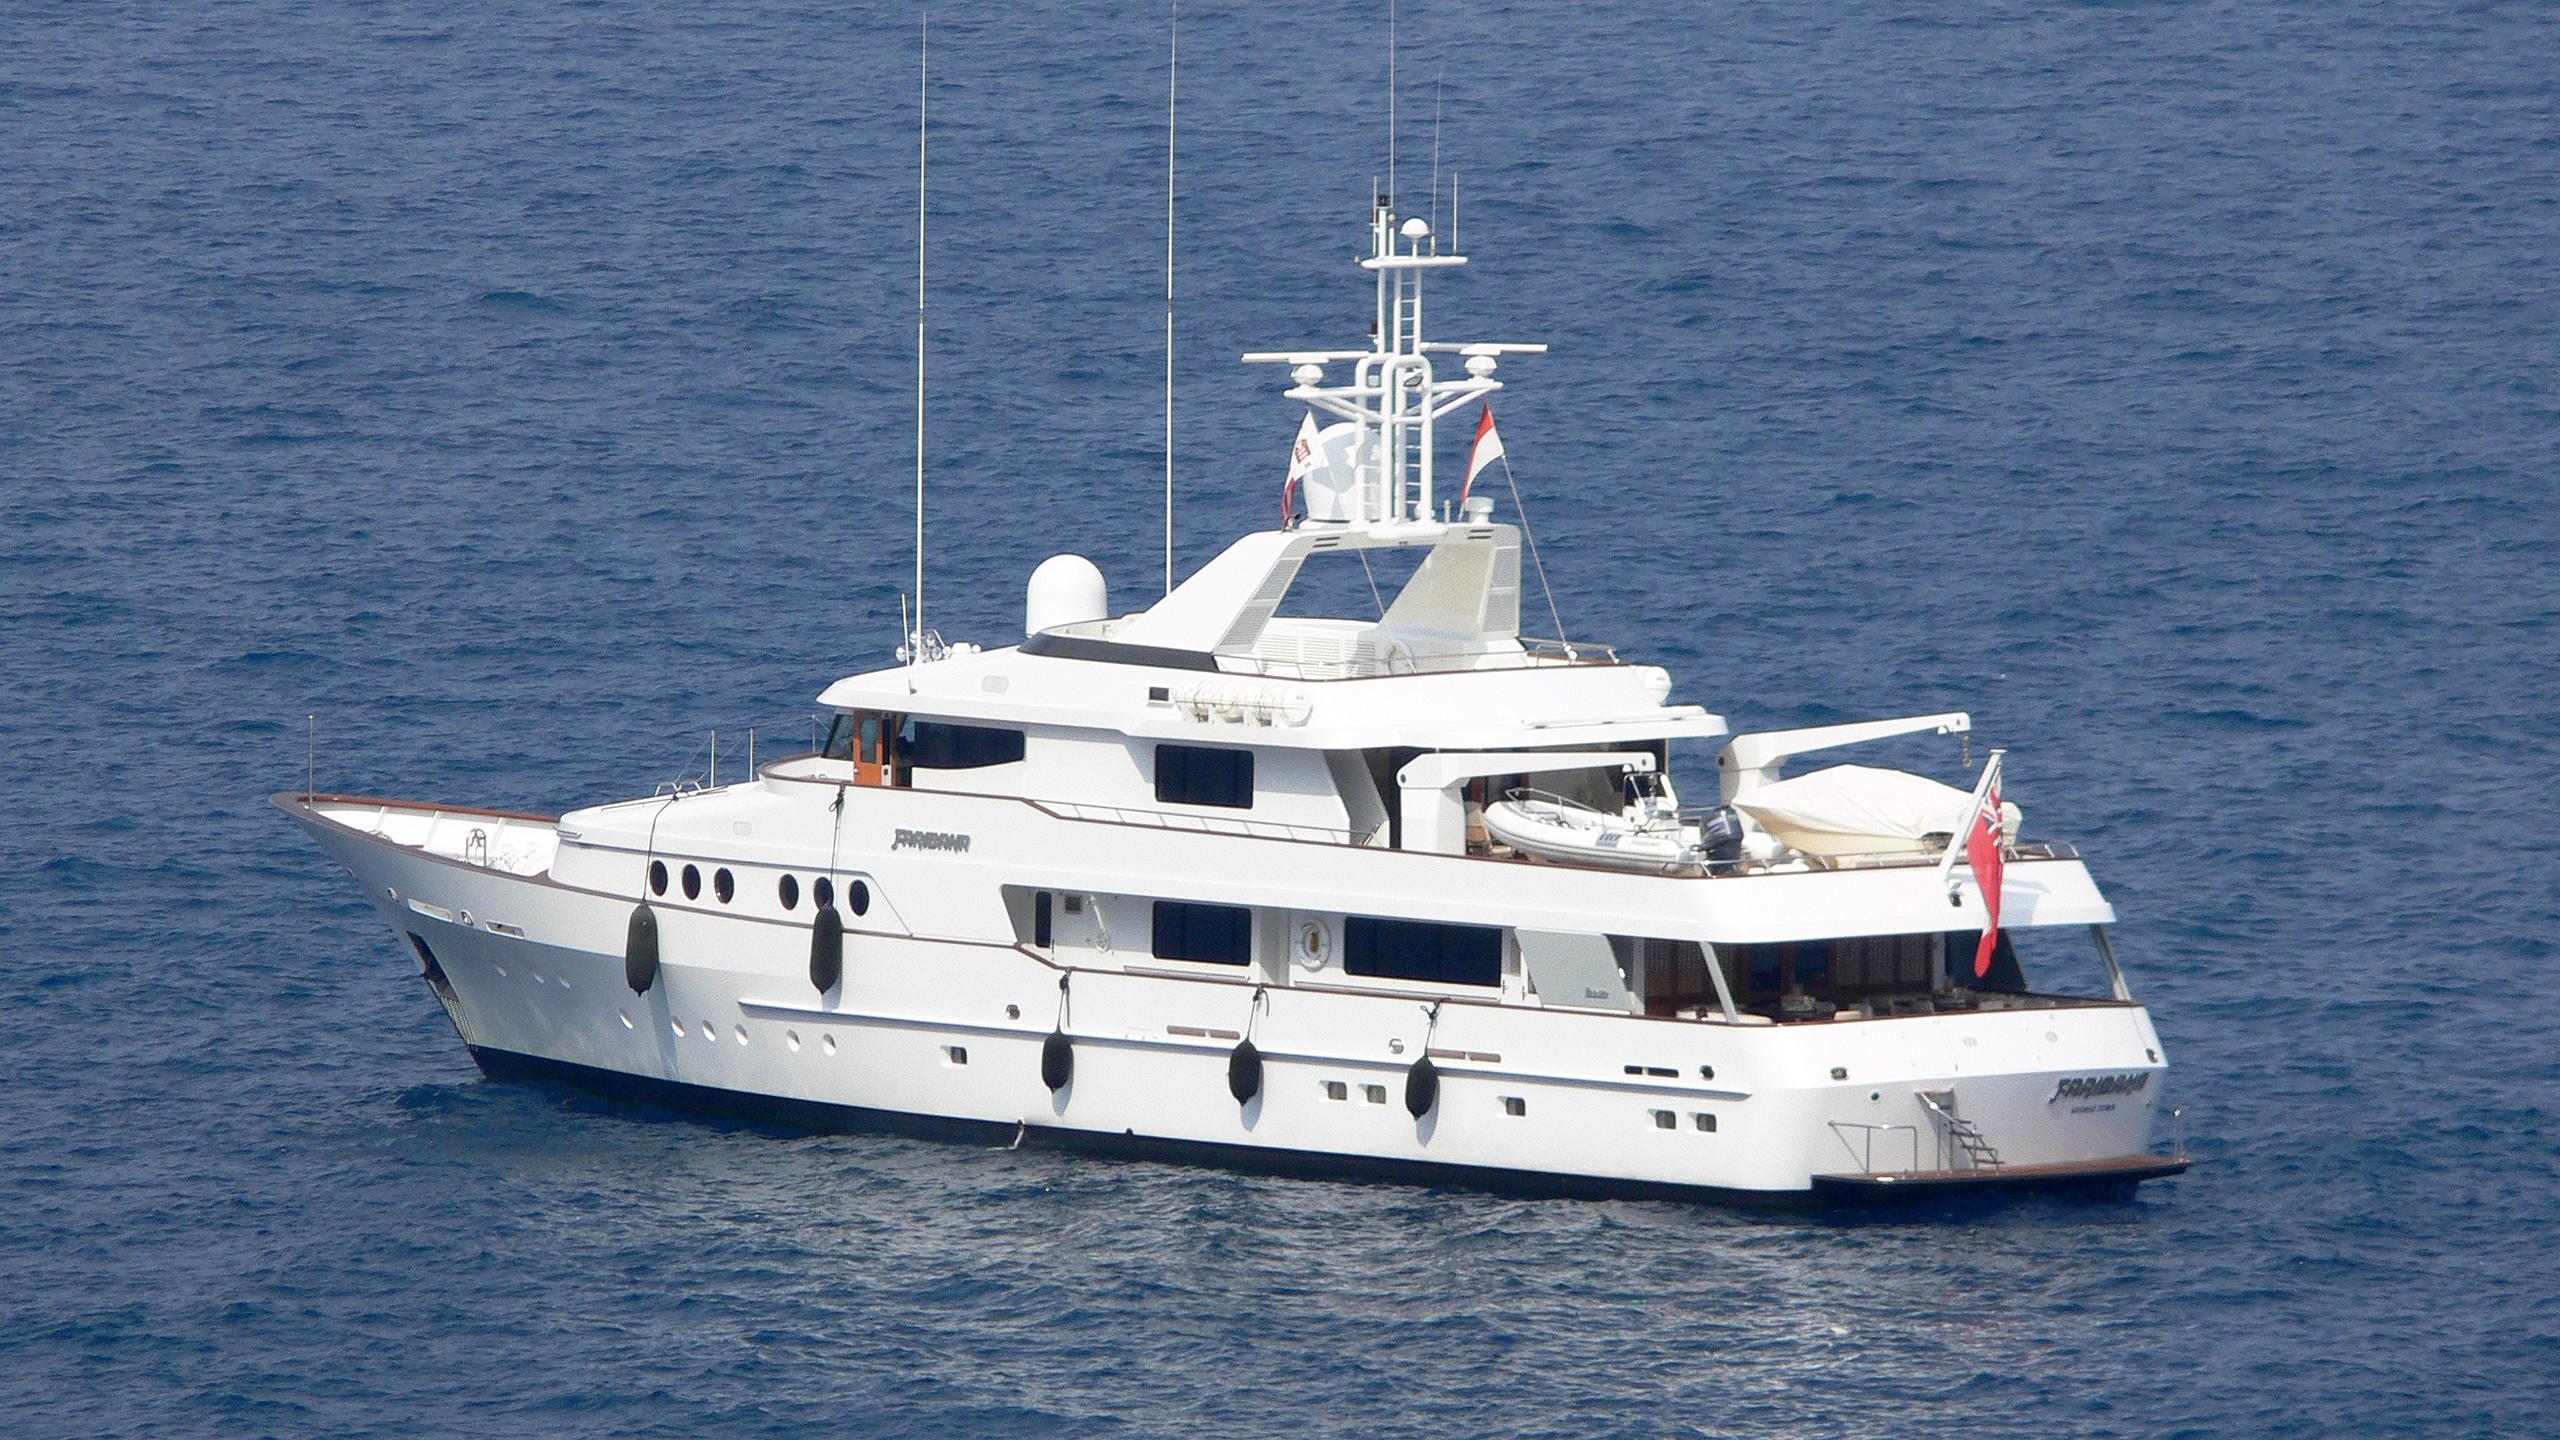 allegra-motor-yacht-feadship-1989-42m-half-profile